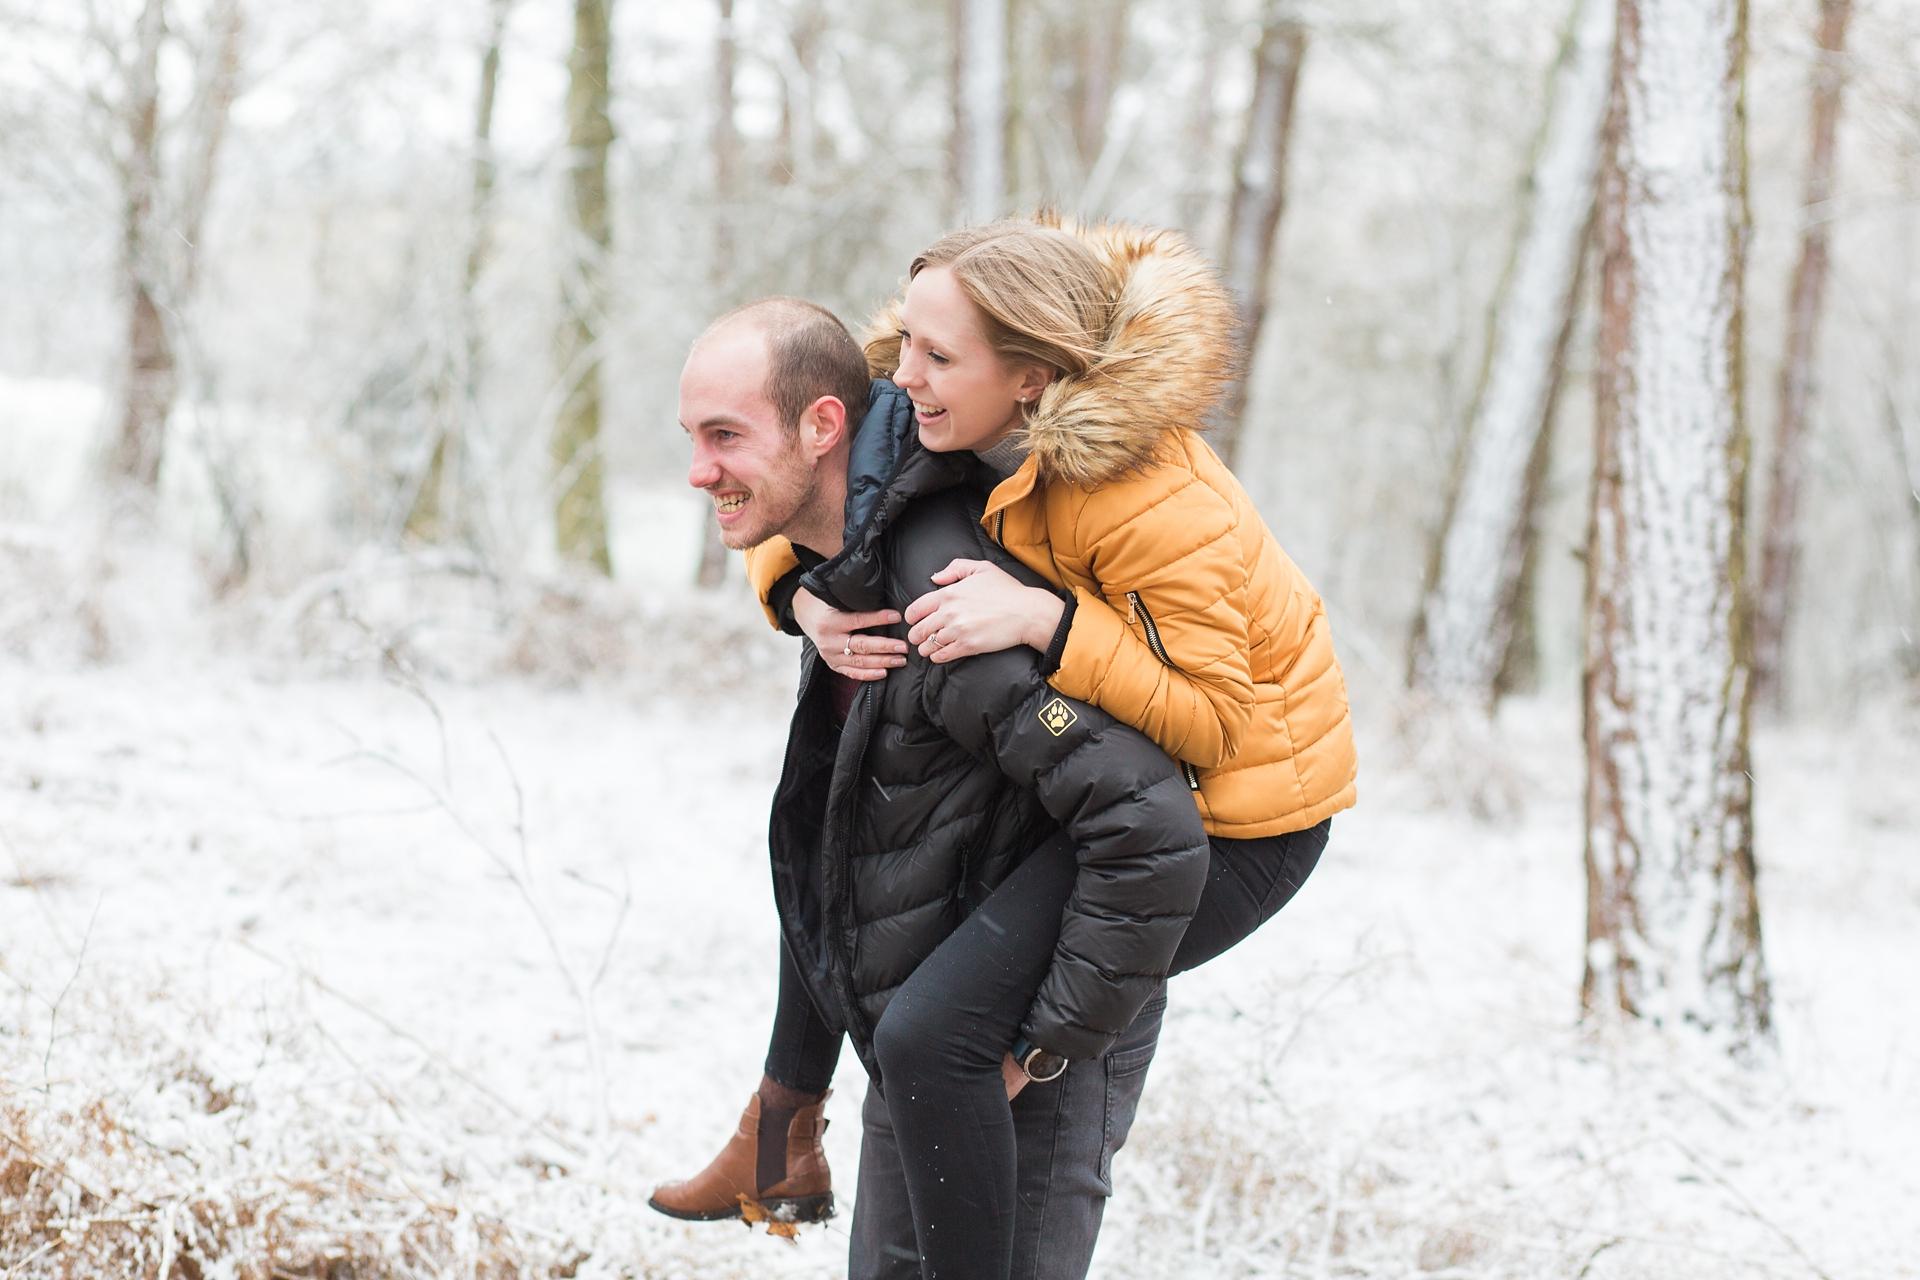 Woodland Engagement Shoot in snow piggyback fun